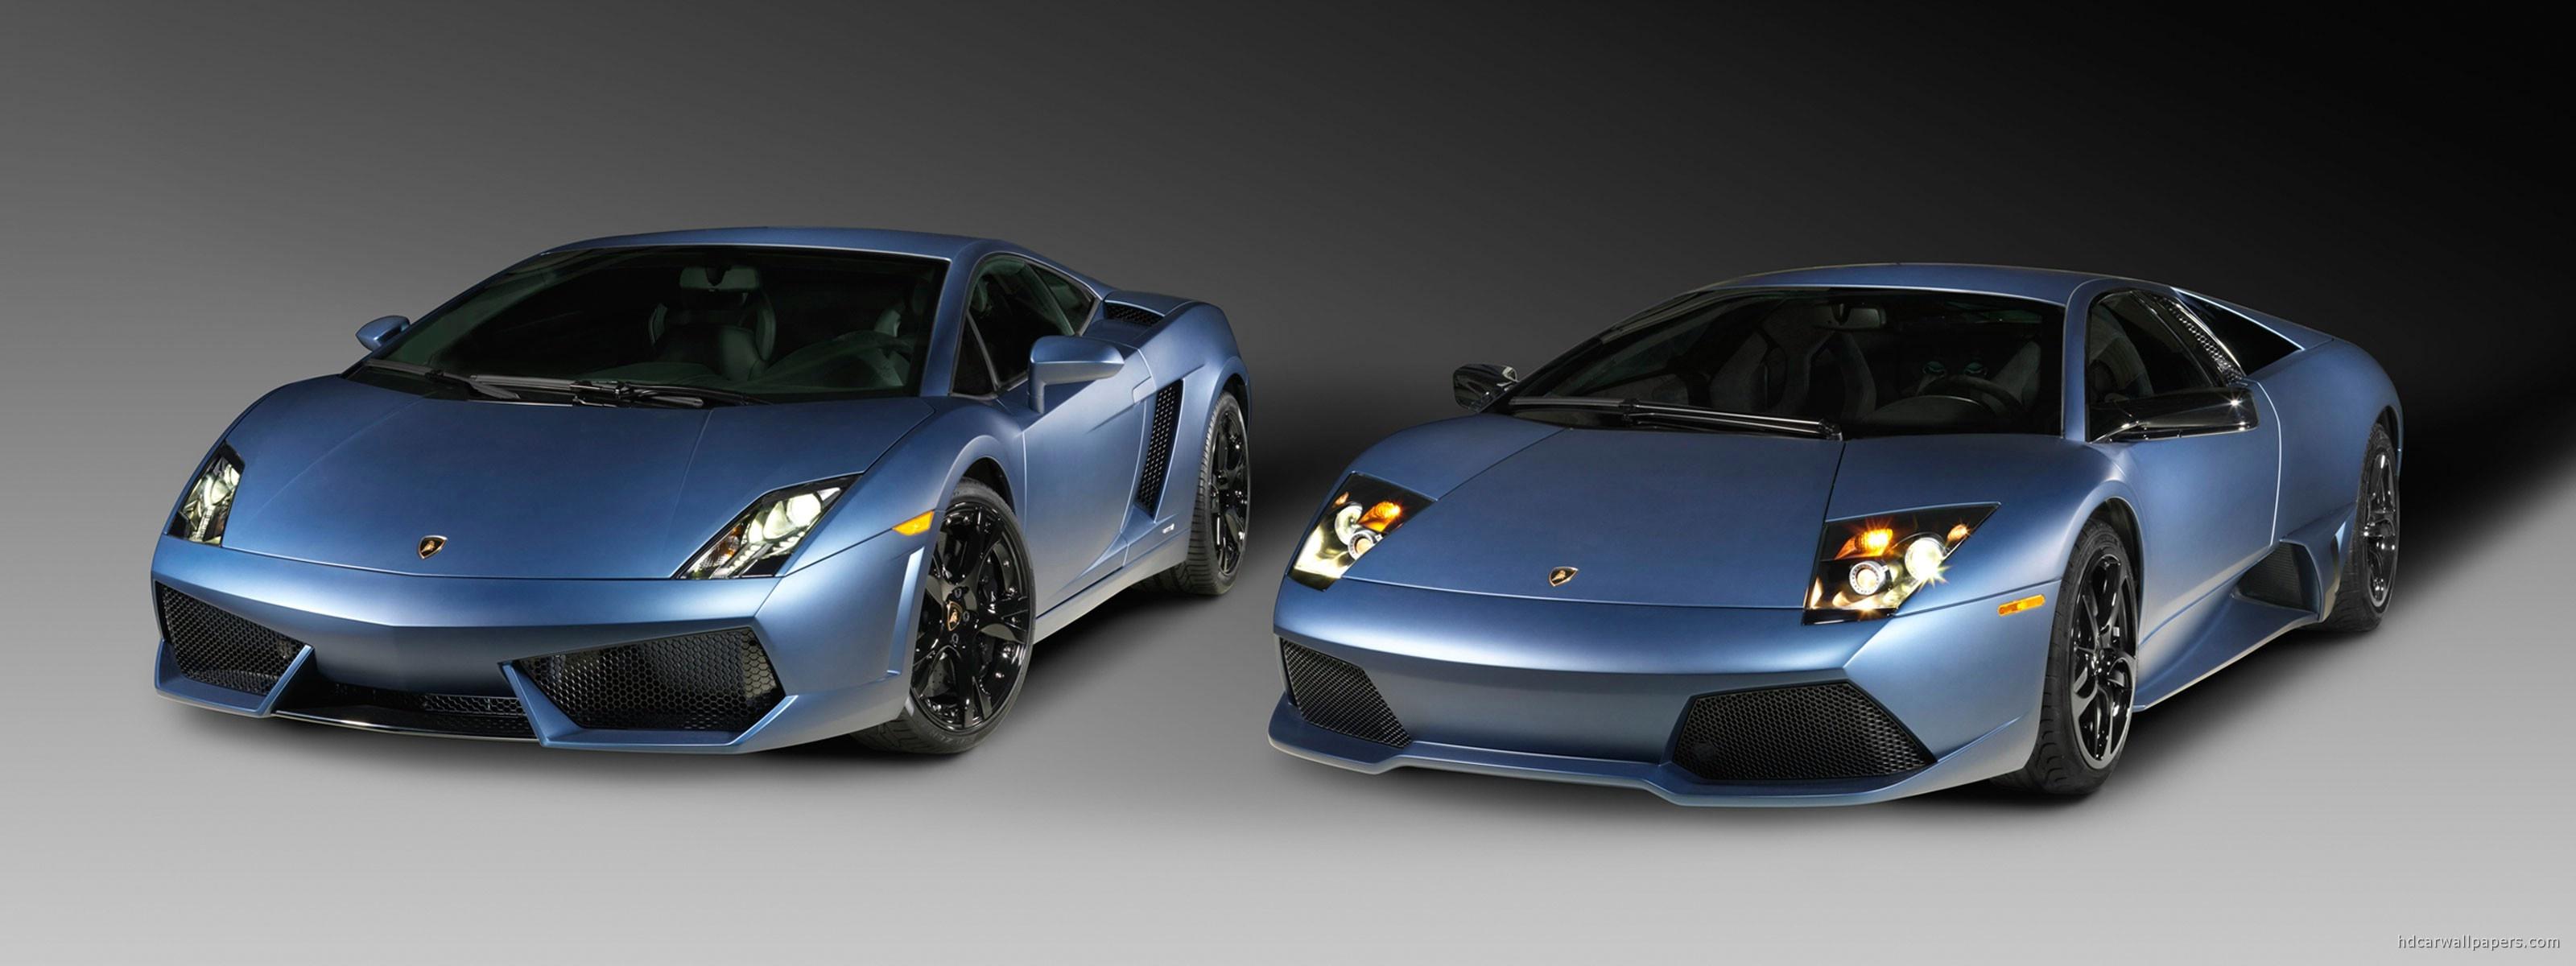 Lamborghini Gallardo Dual Monitor Wallpaper in 3200x1200 Resolution 3200x1200